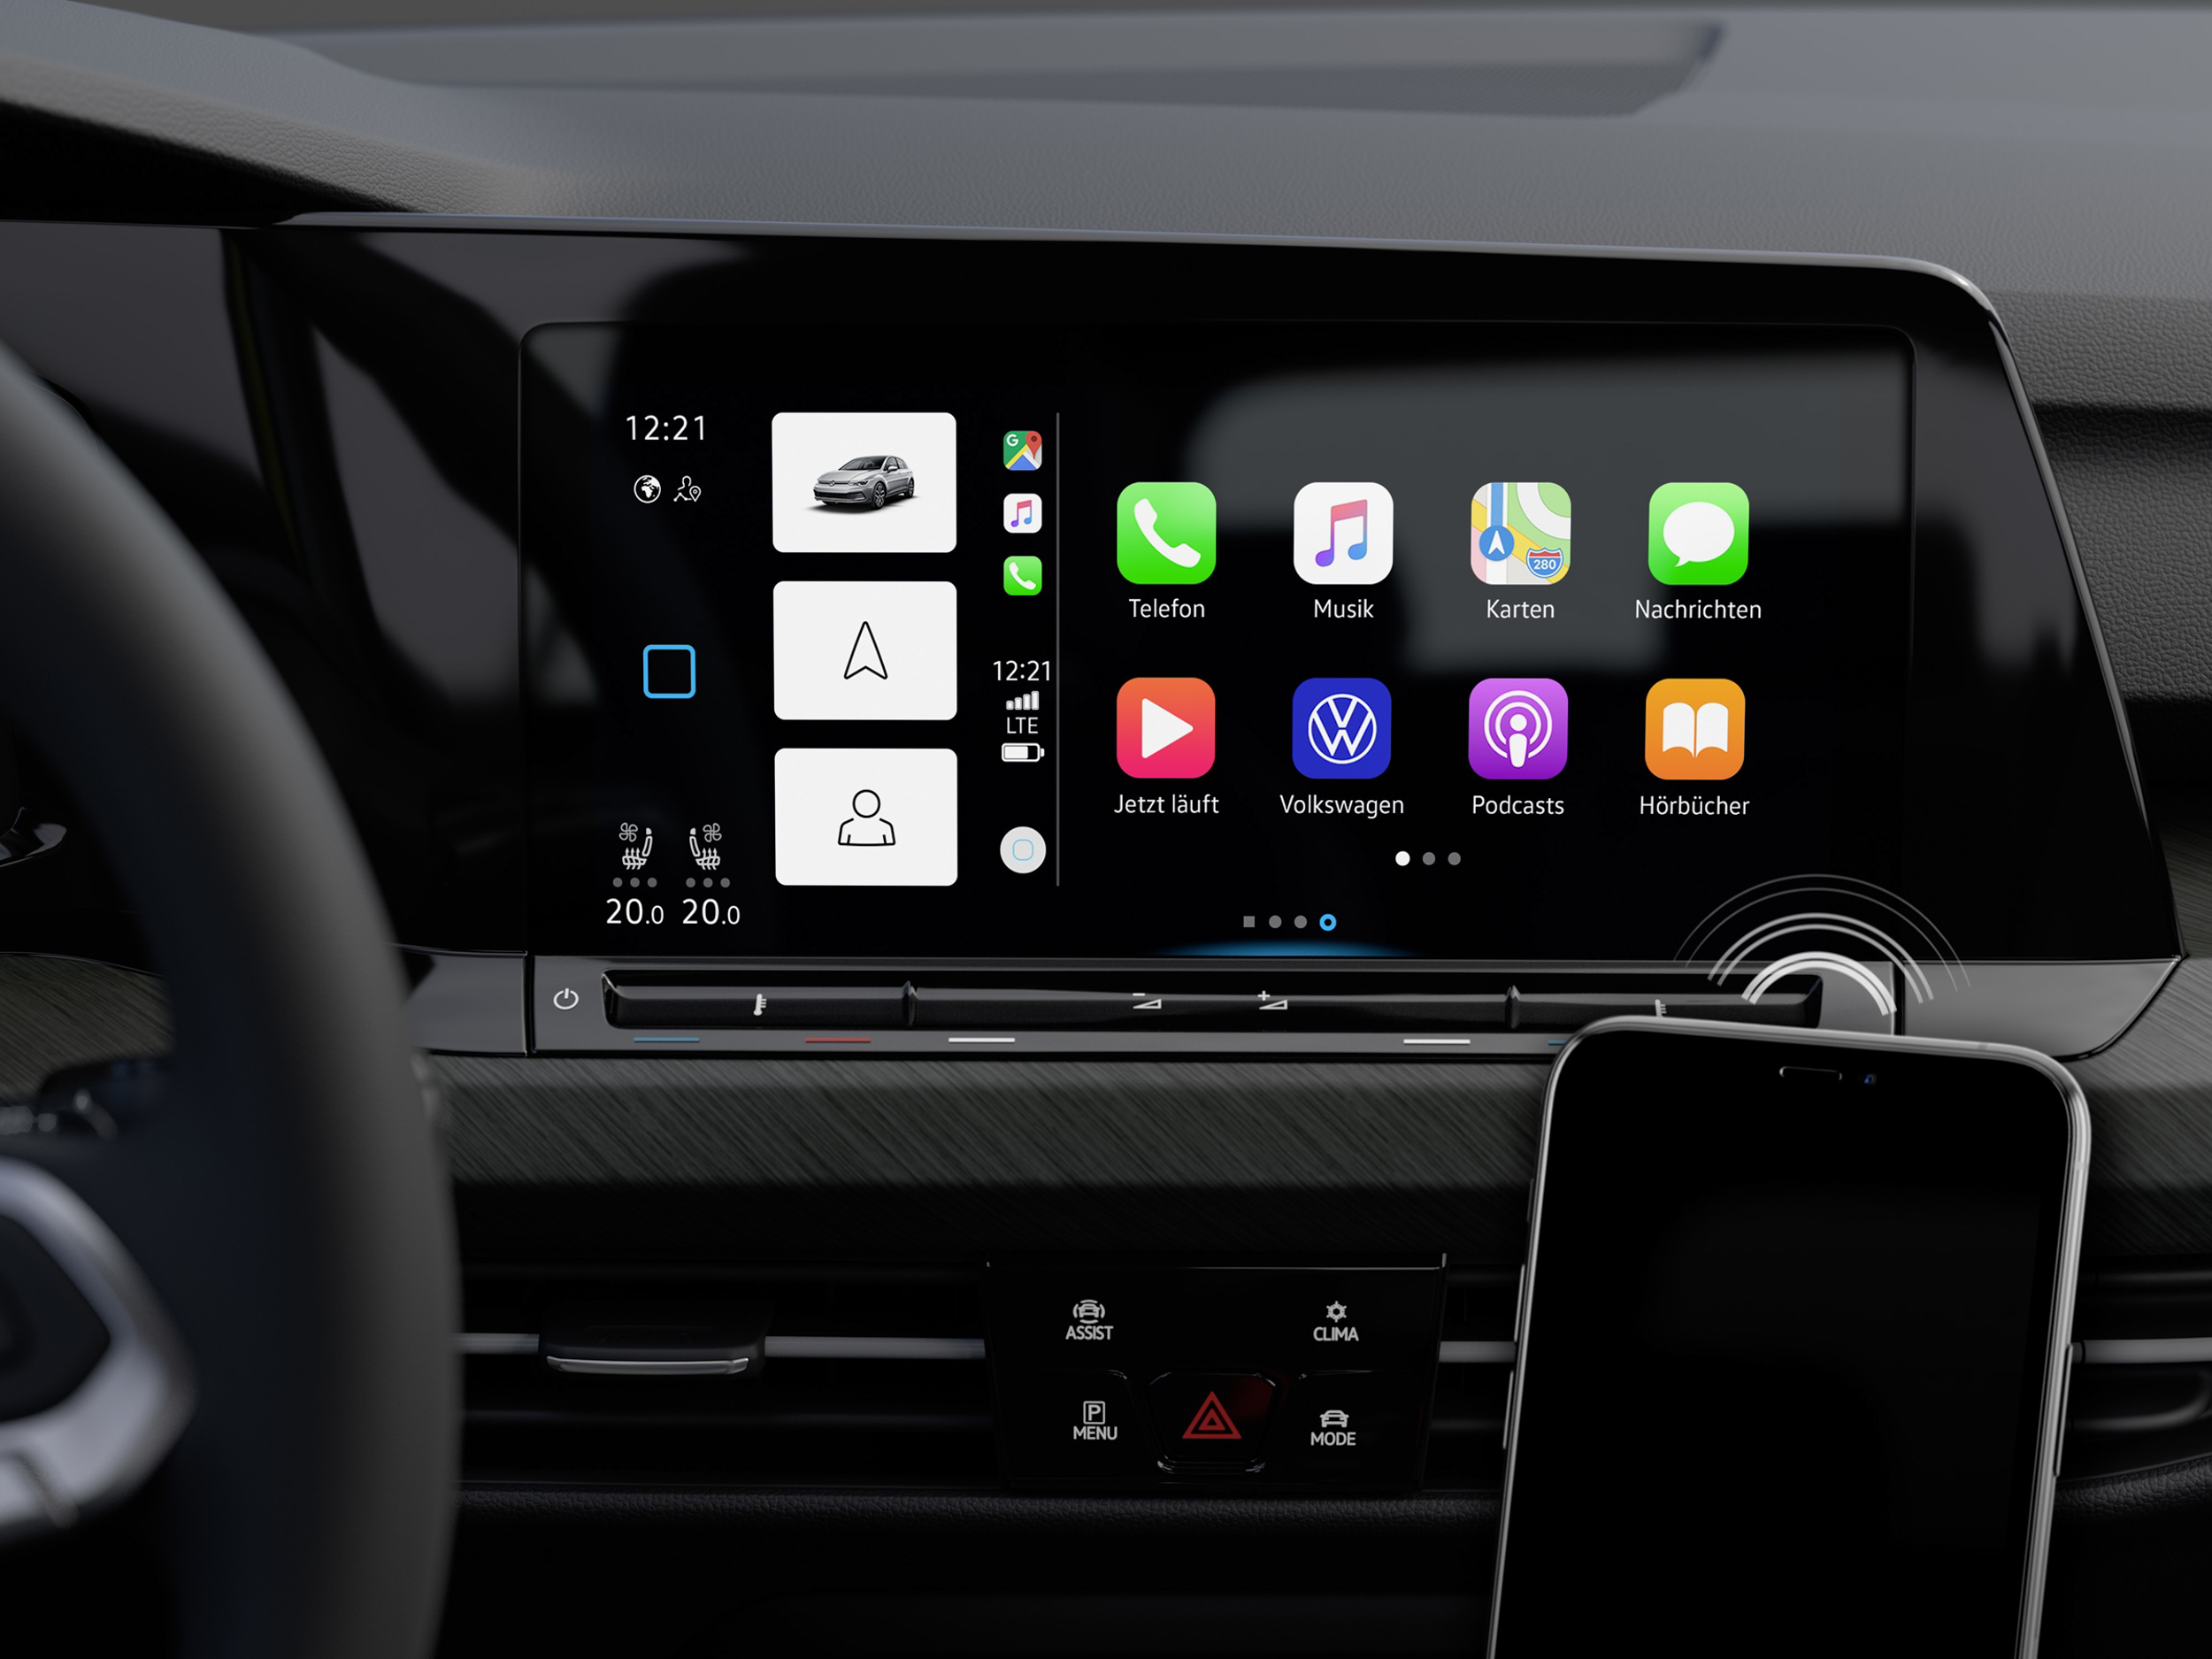 Style以上車型支援無線Apple CarPlay及提供Volkswagen首款無線Android Auto功能。